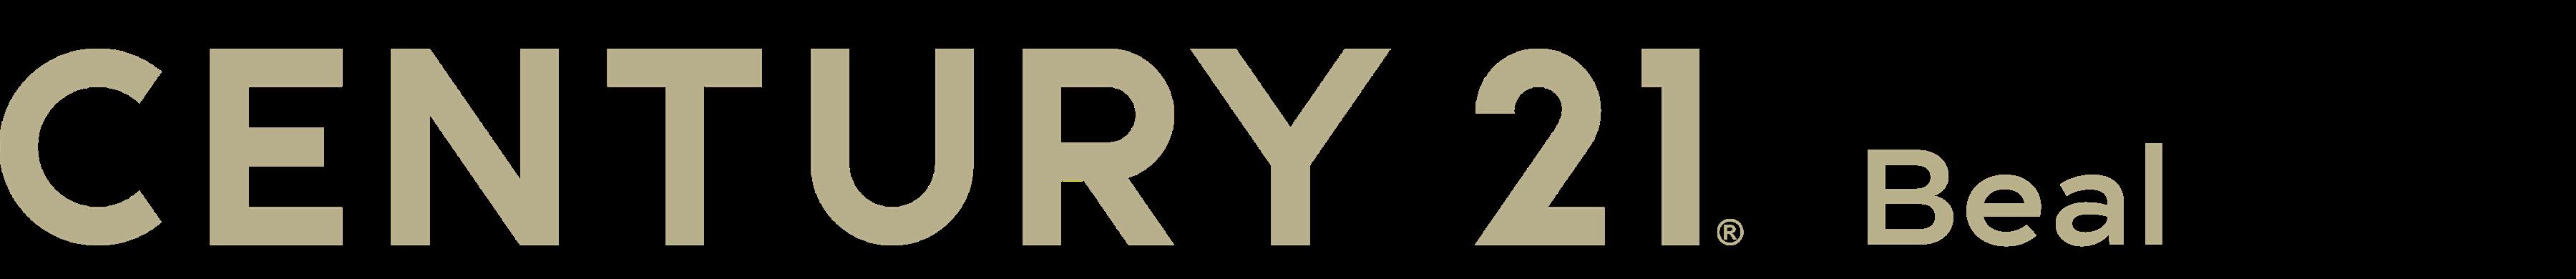 Century 21 Beal logo